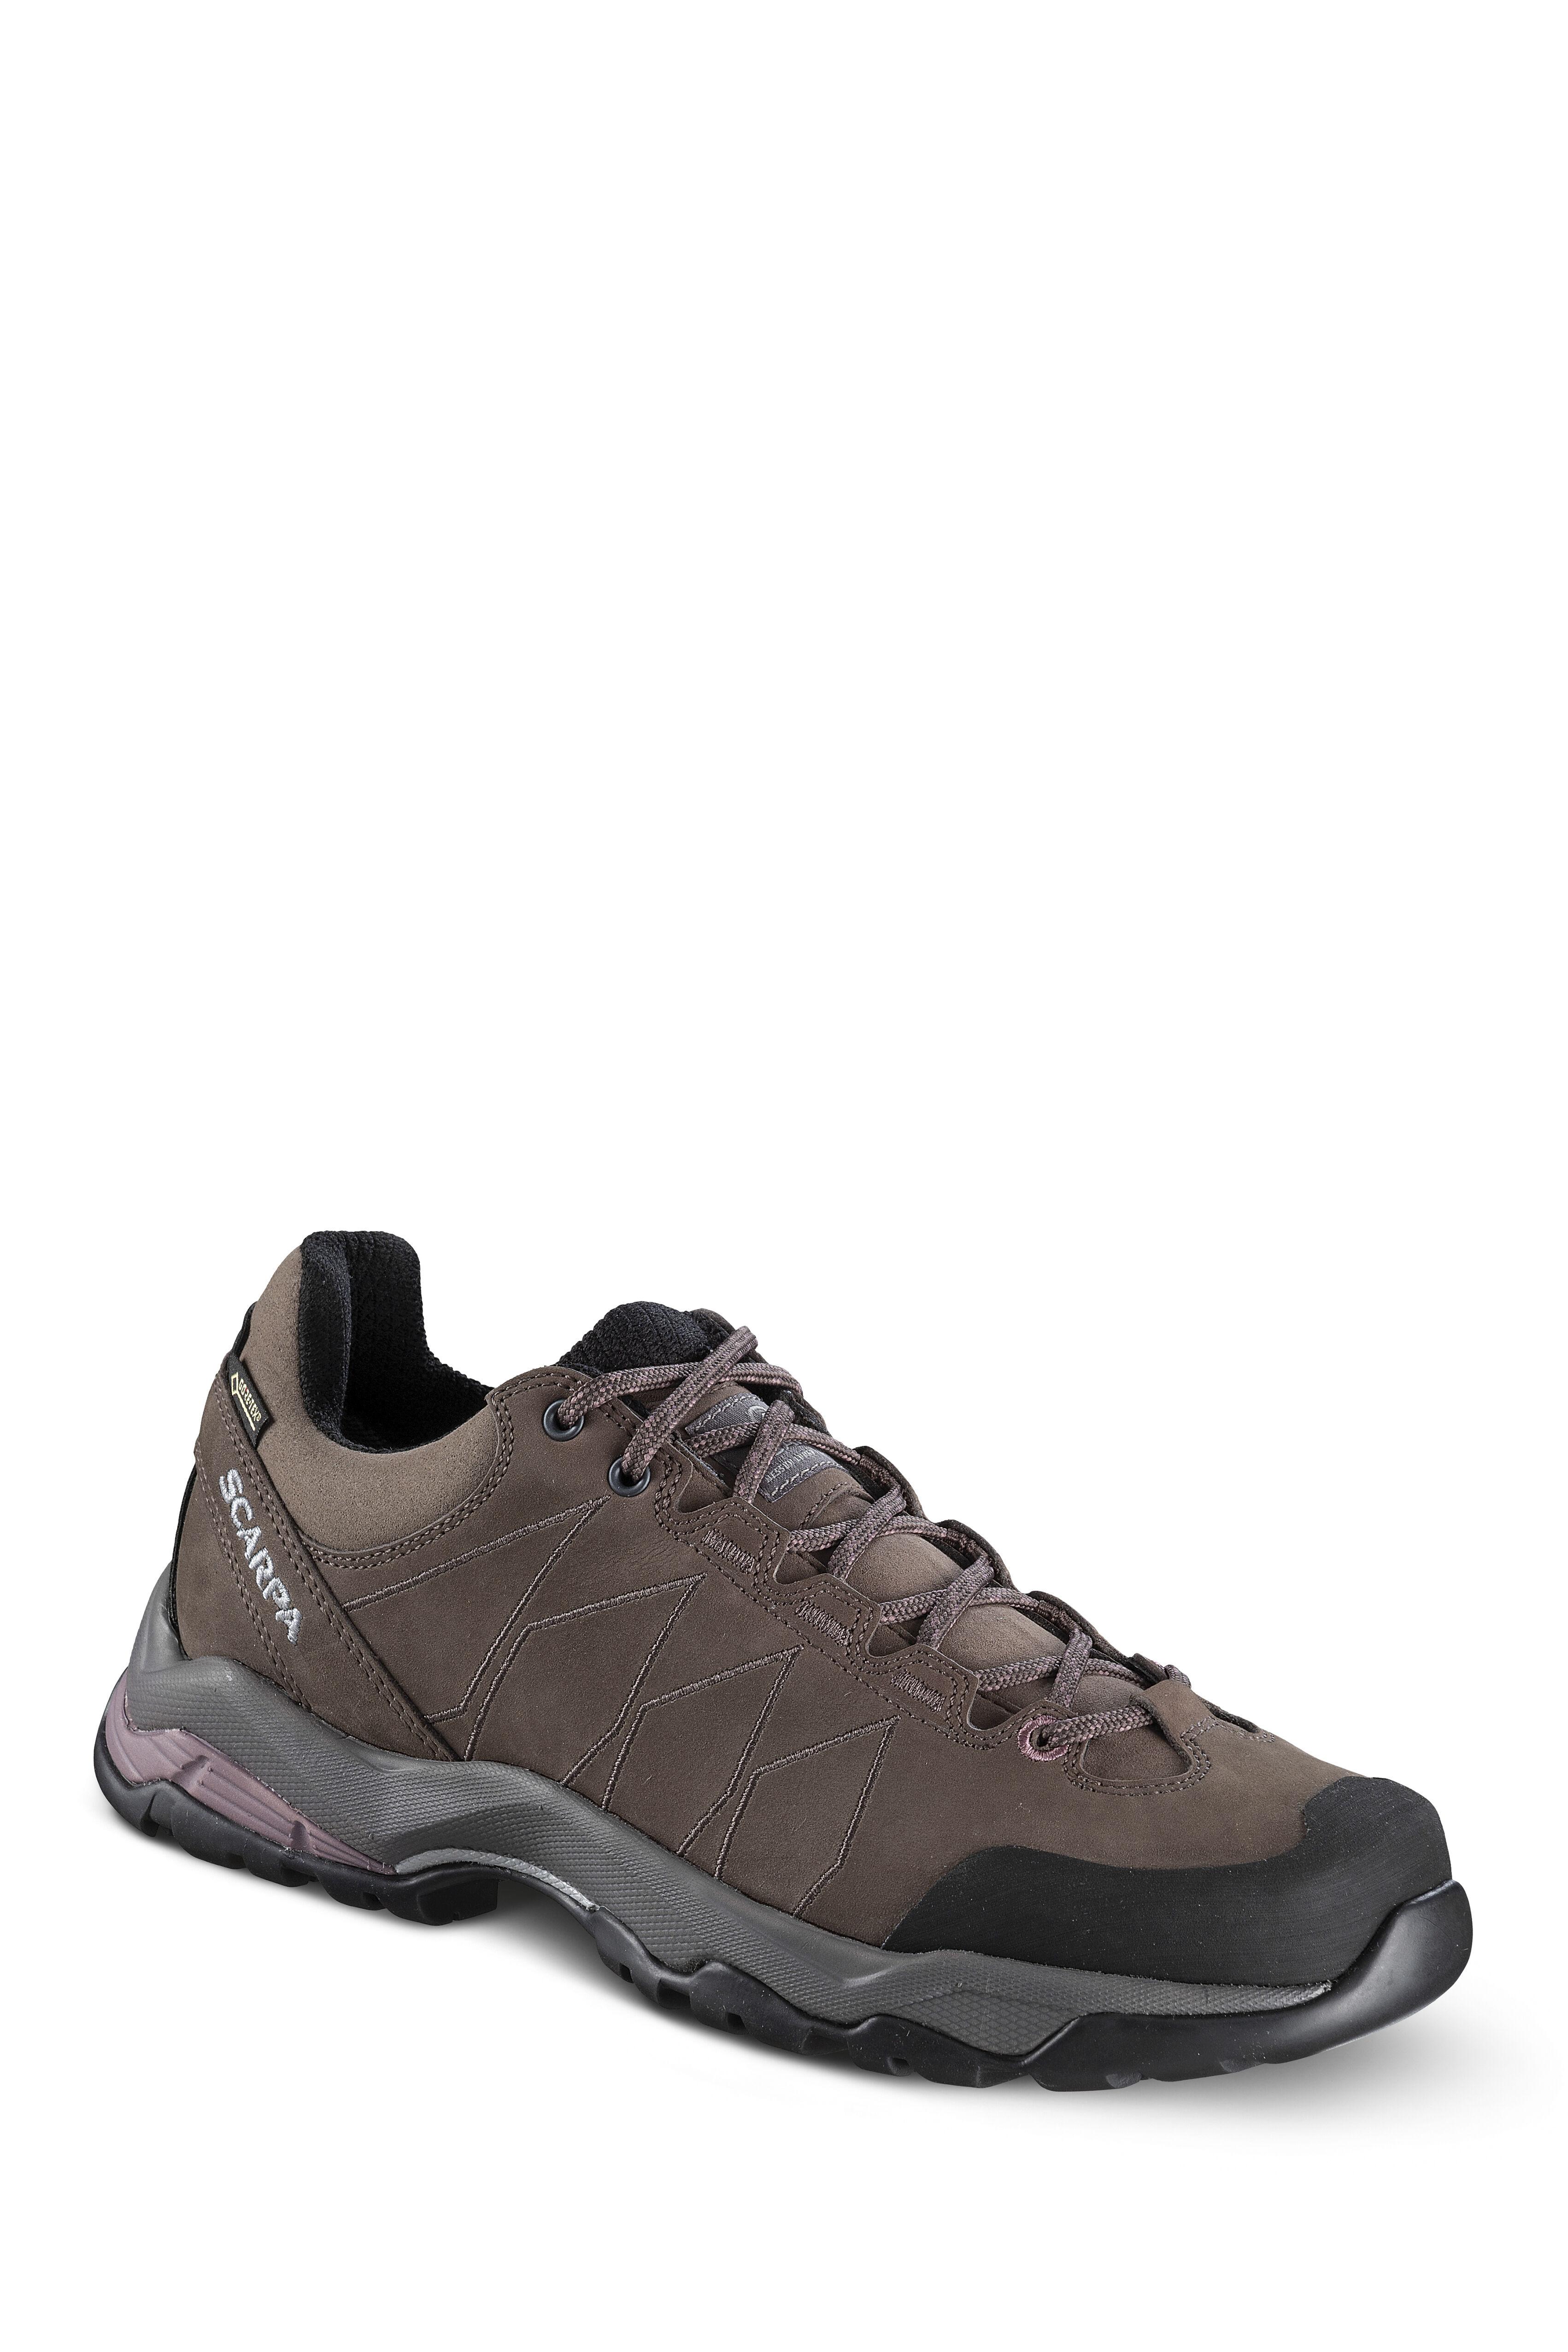 Scarpa Moraine Plus GTX Hiking Shoes